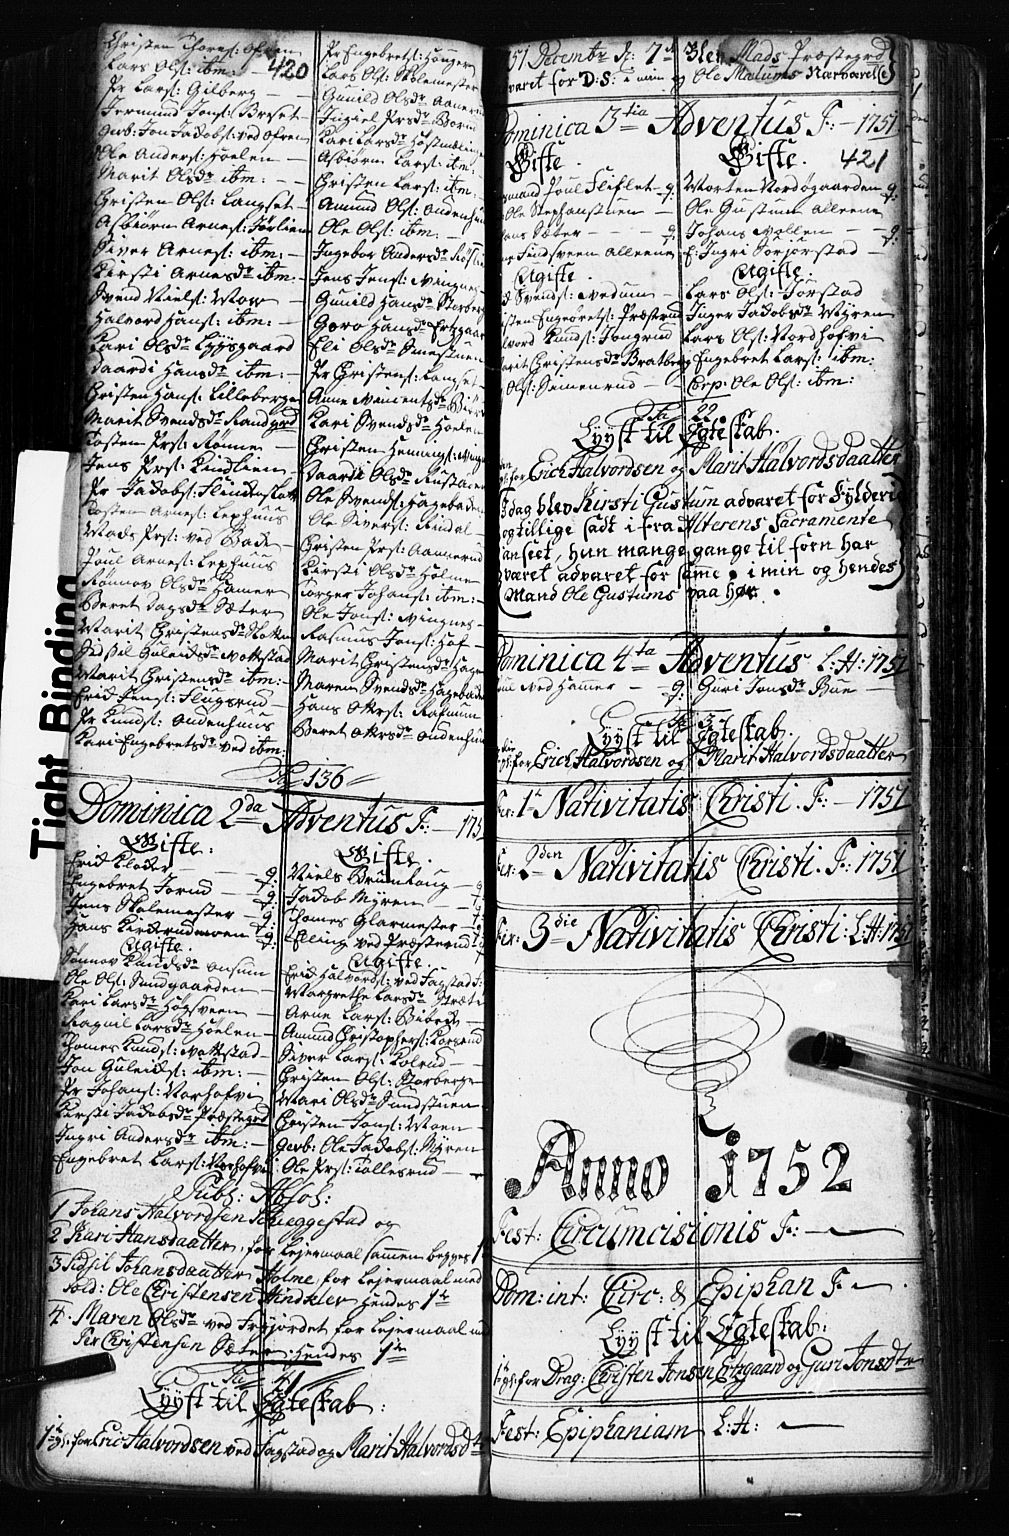 SAH, Fåberg prestekontor, Klokkerbok nr. 2, 1741-1756, s. 420-421